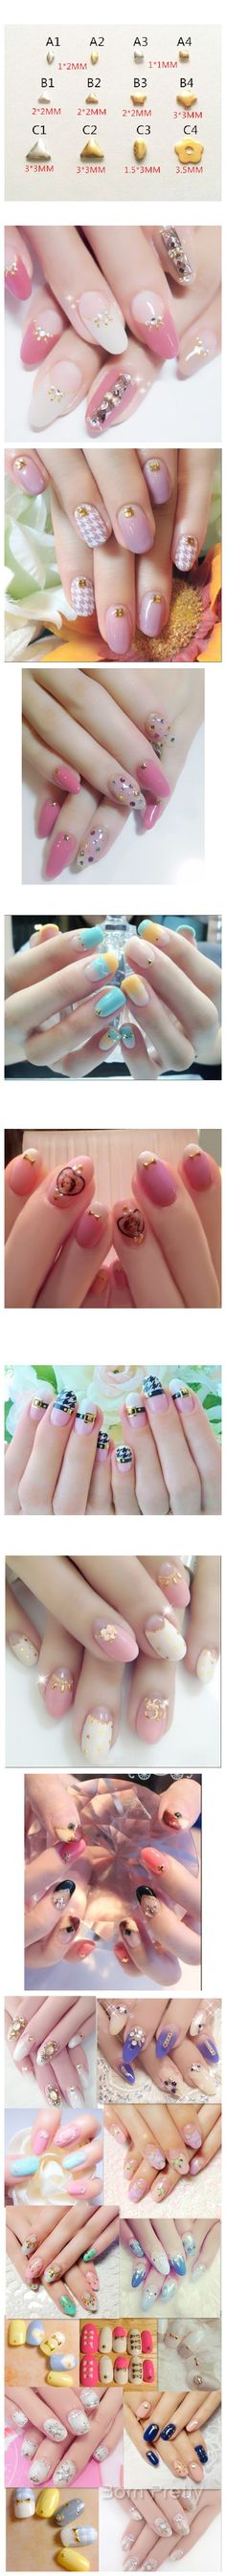 $3.20 20Pcs/set Flower Triangle Star Super Mini Nail Studs Fashion 3D Nail Art Decoration - BornPrettyStore.com